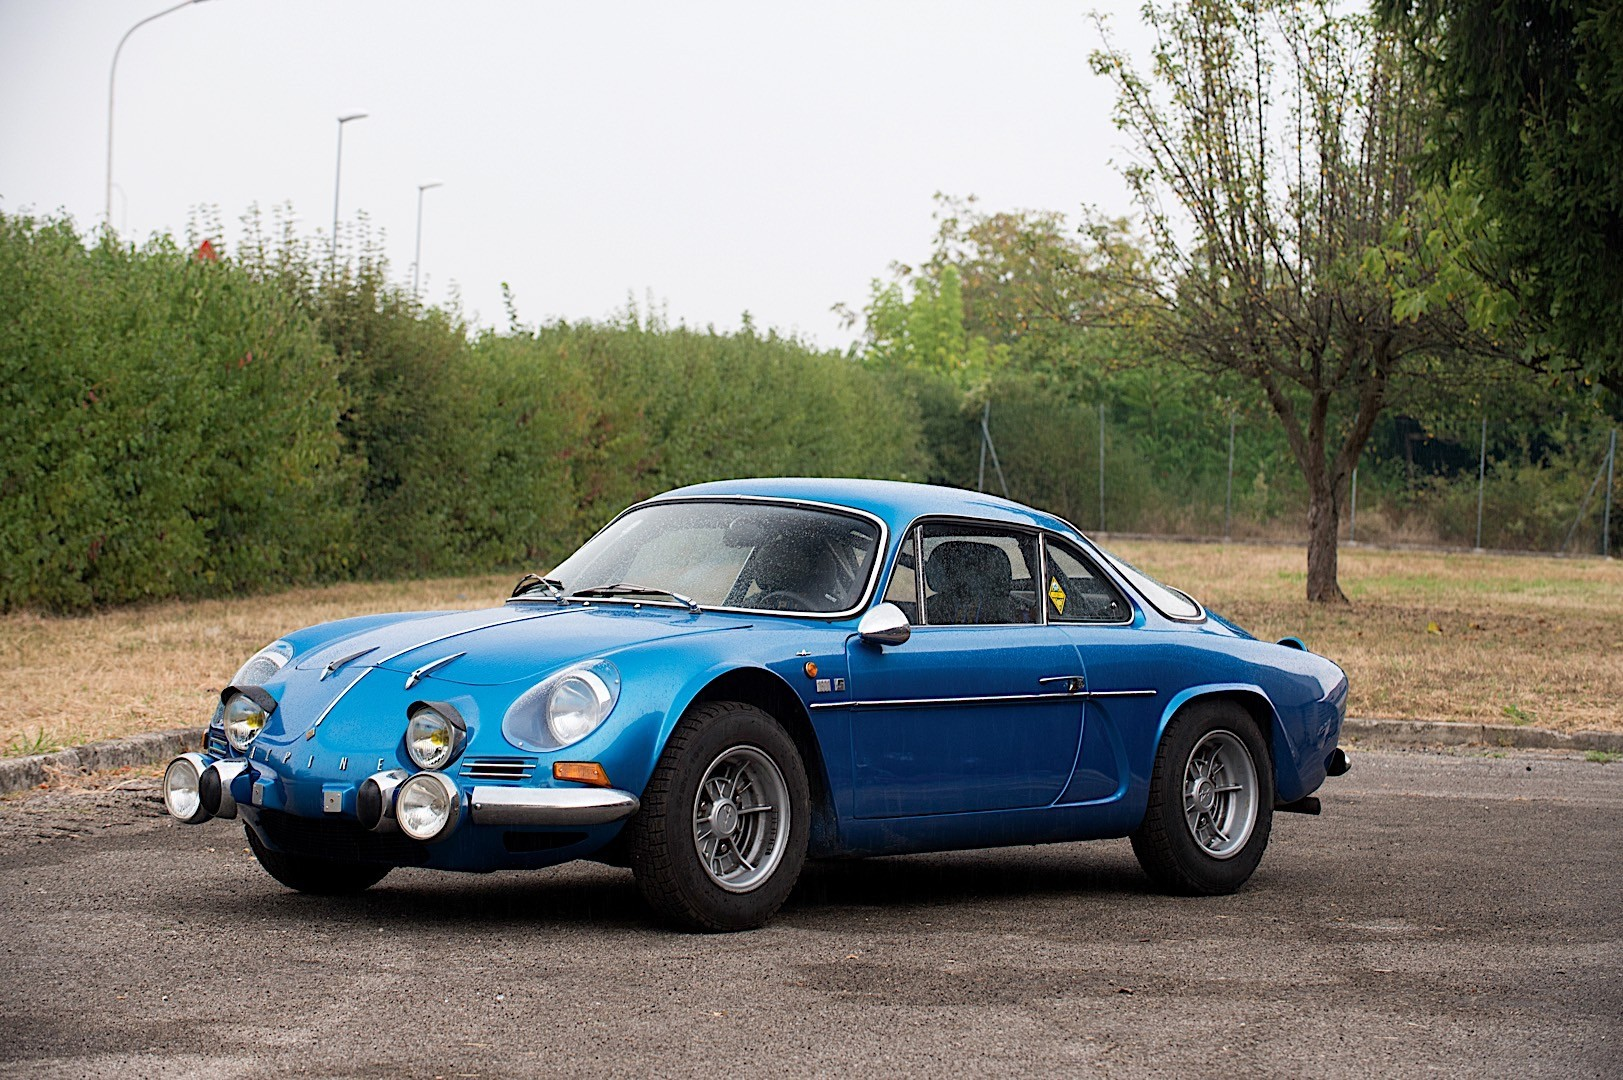 1962 renault alpine a110 - photo #27